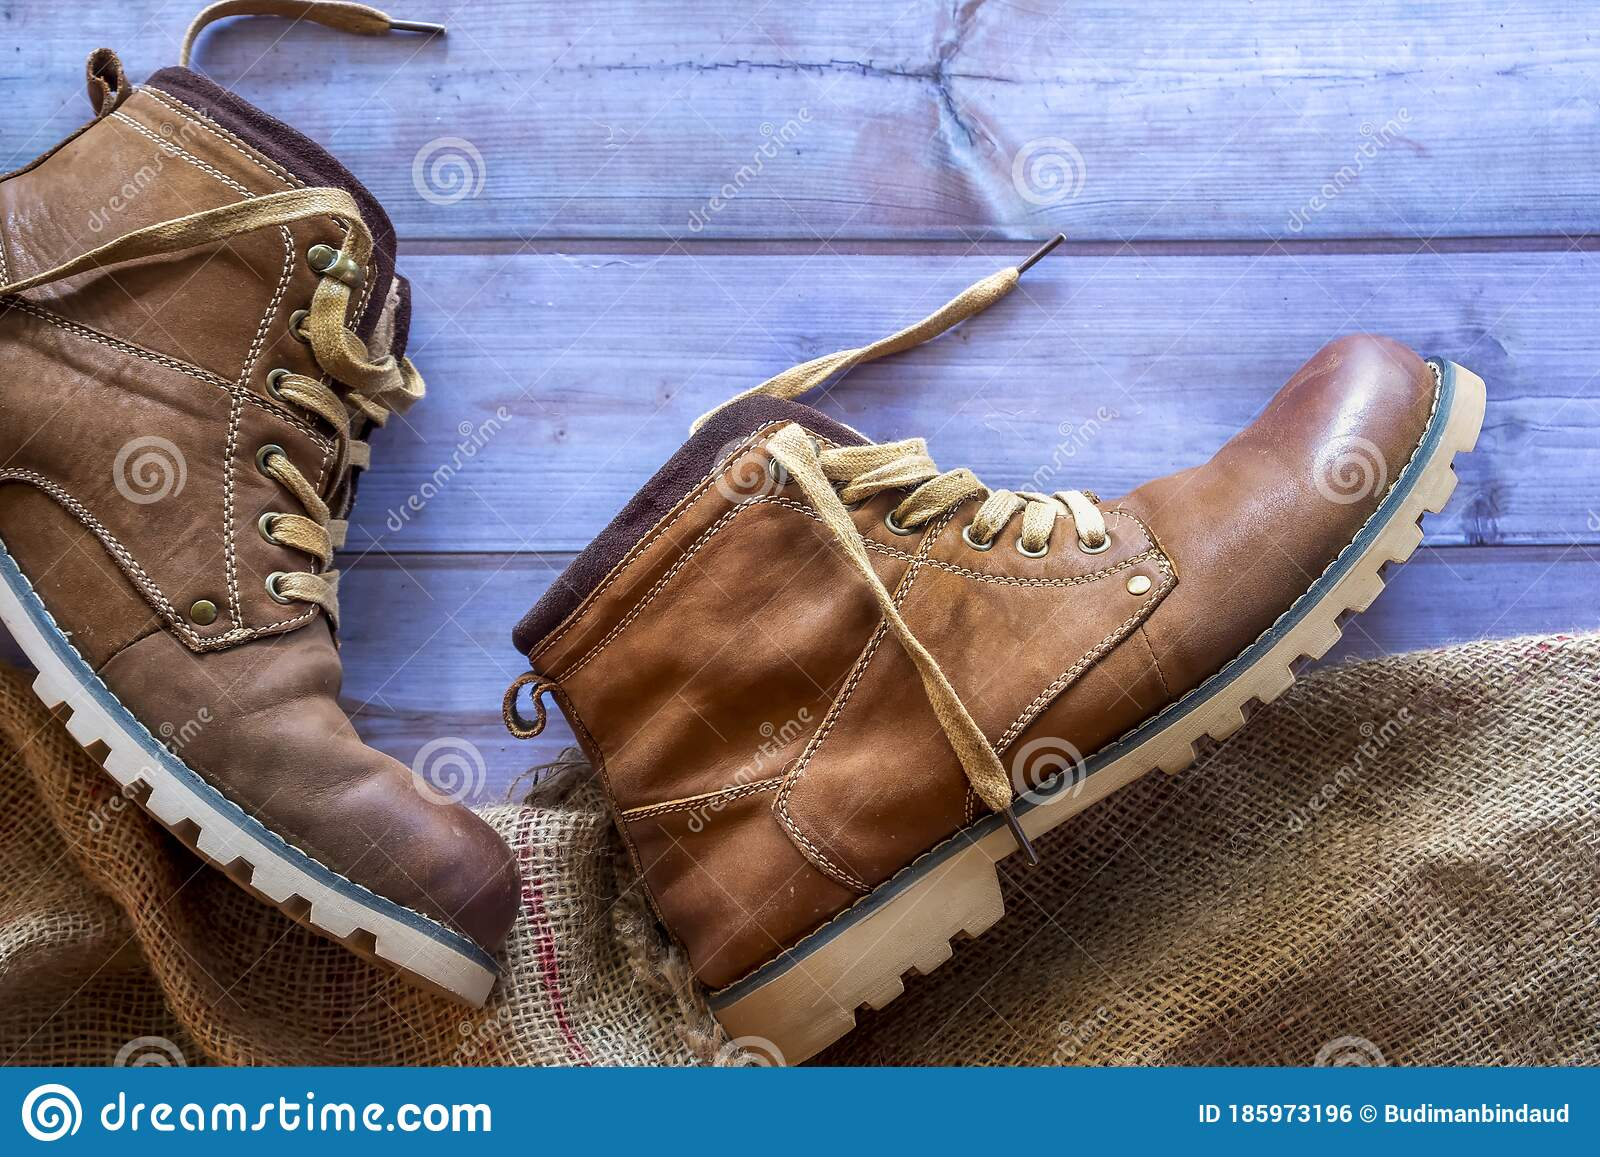 stylish leather hiking boots